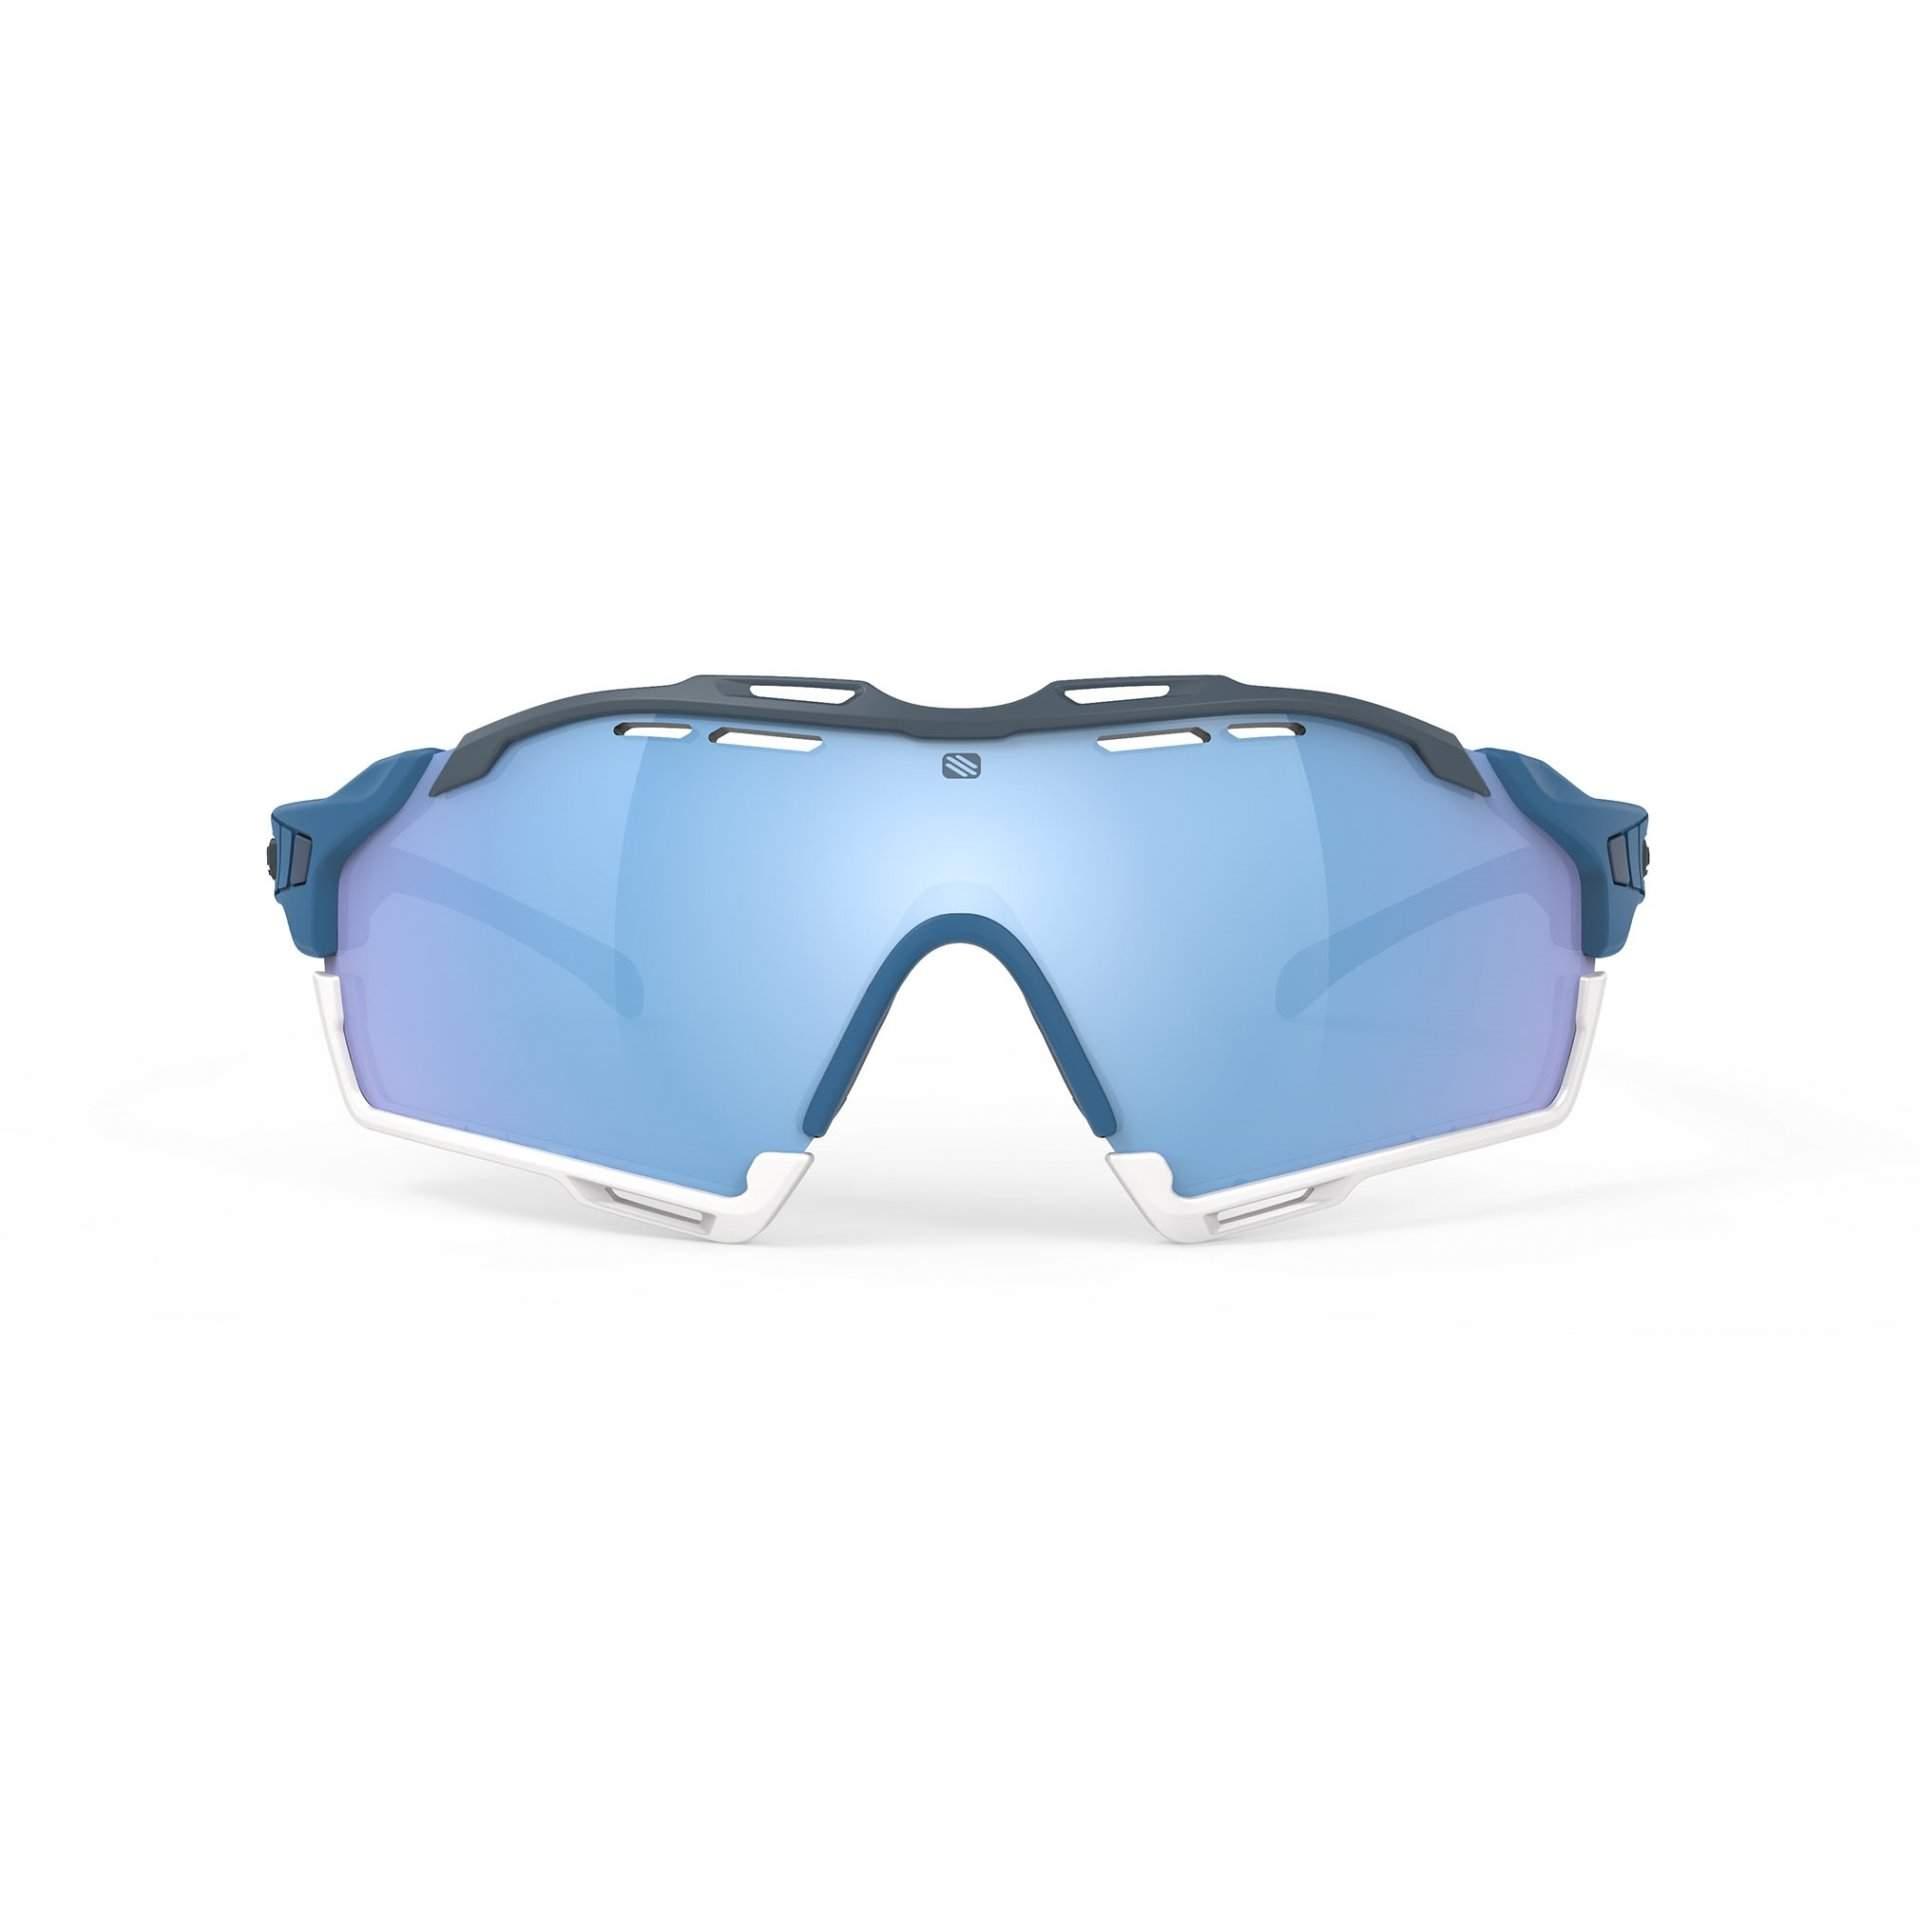 OKULARY RUDY PROJECT CUTLINE MULTILASER ICE + PACIFIC BLUE MATTE SP6368490000 Z PRZODU